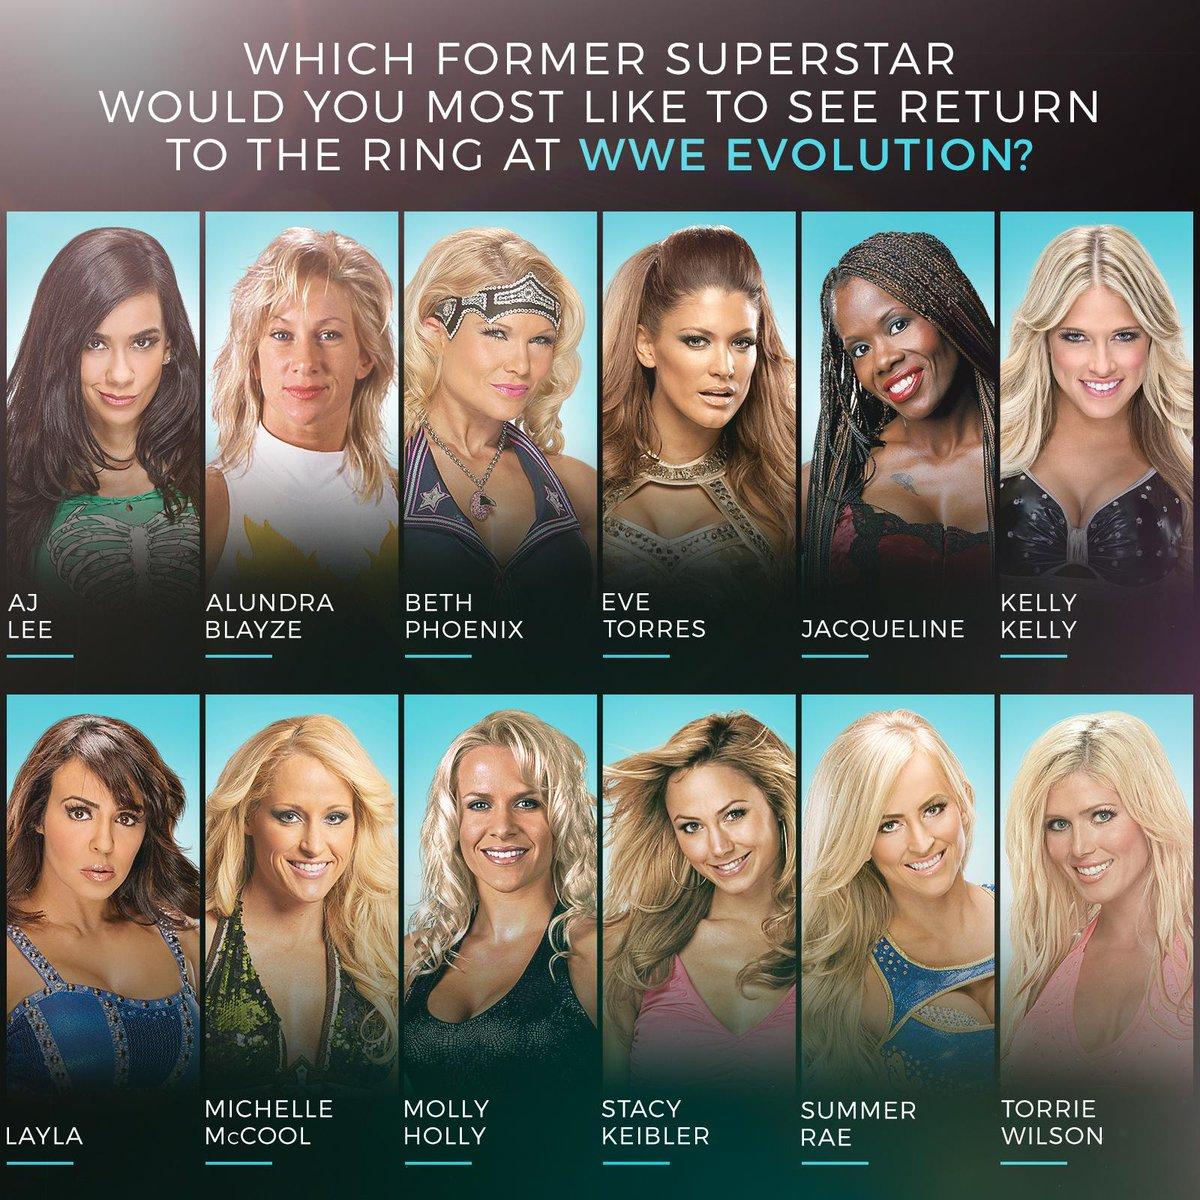 RT @WWE: ???????????? #WWEEvolution https://t.co/ZFFGQoFGOh